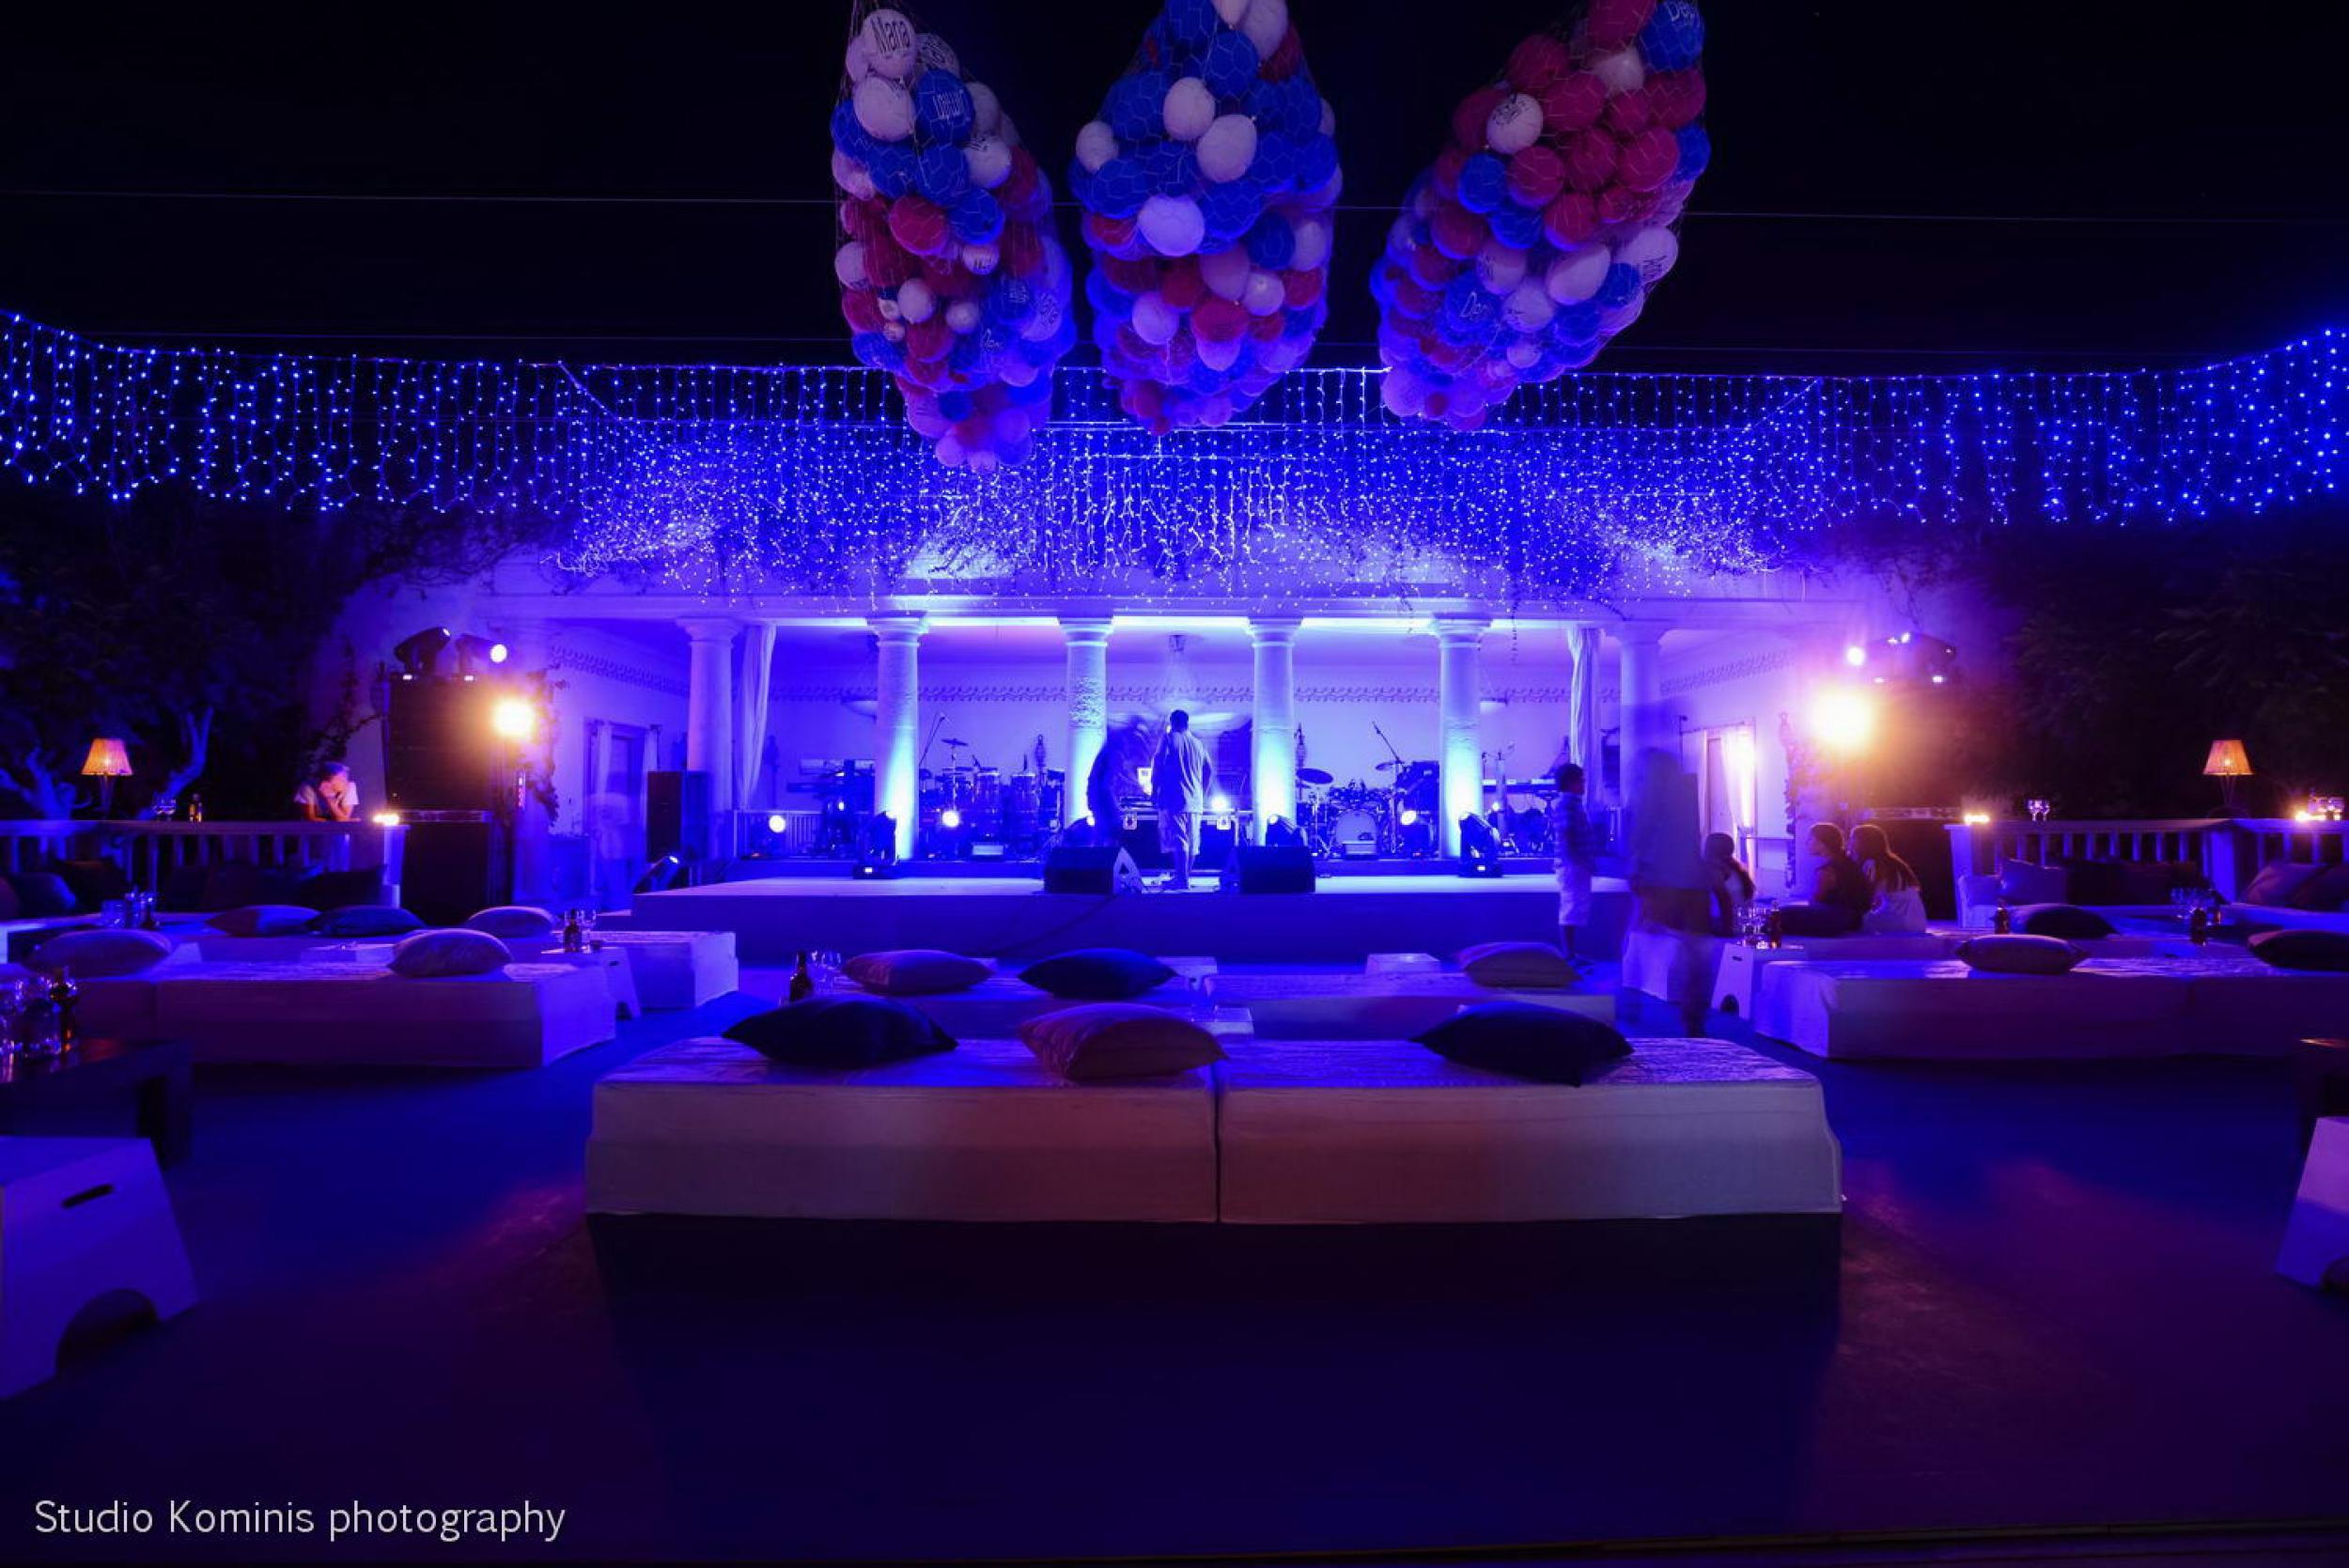 D Schoinousa birthday party - Image 14